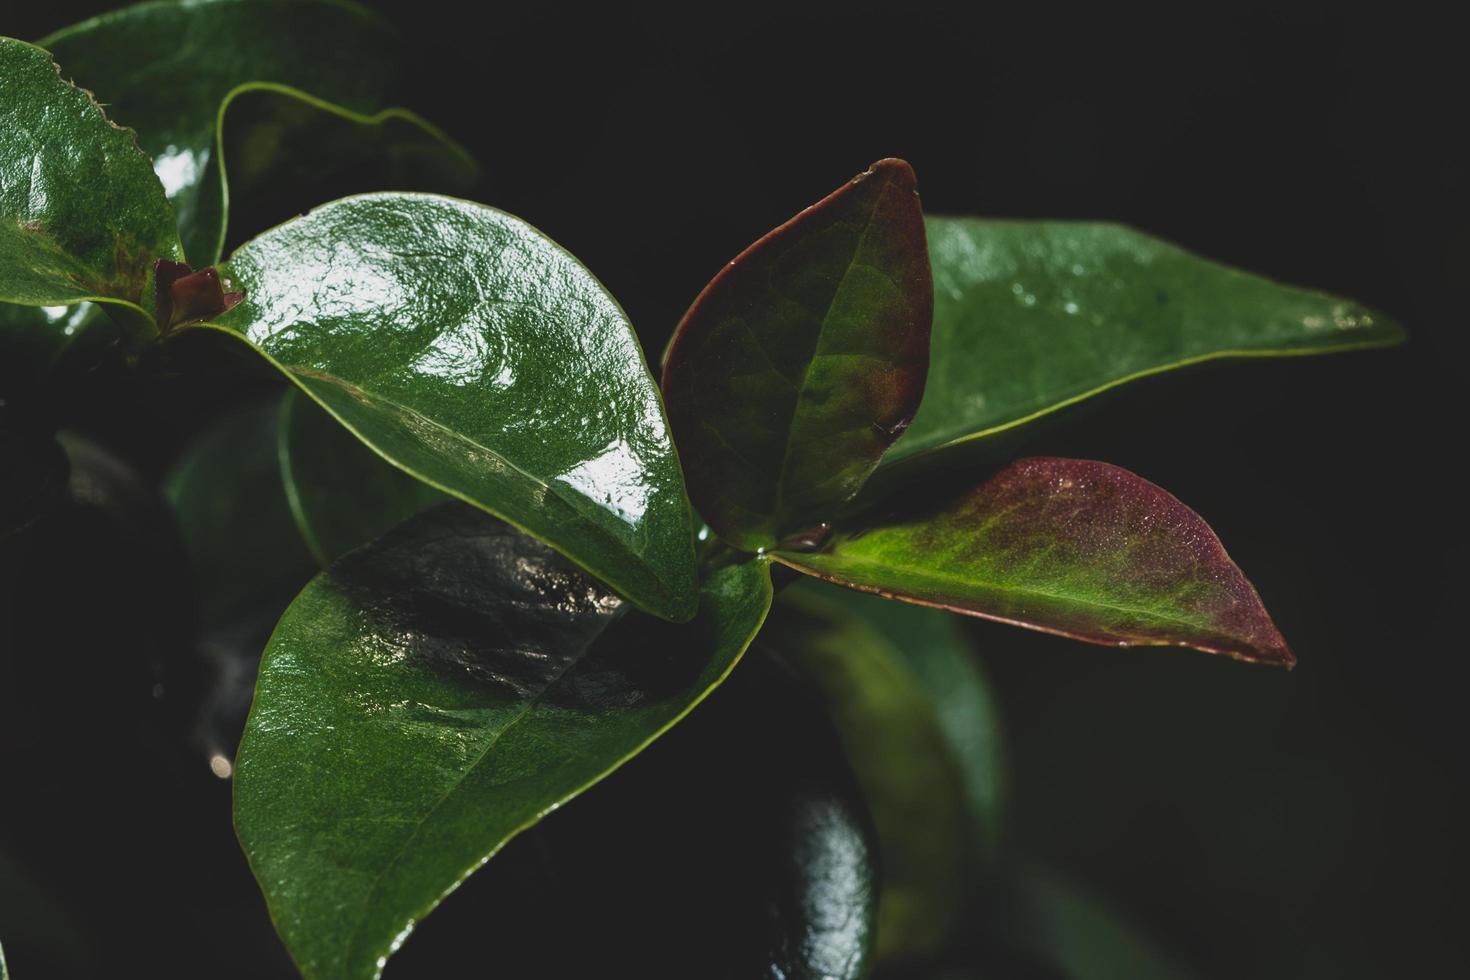 Dark leaves background photo